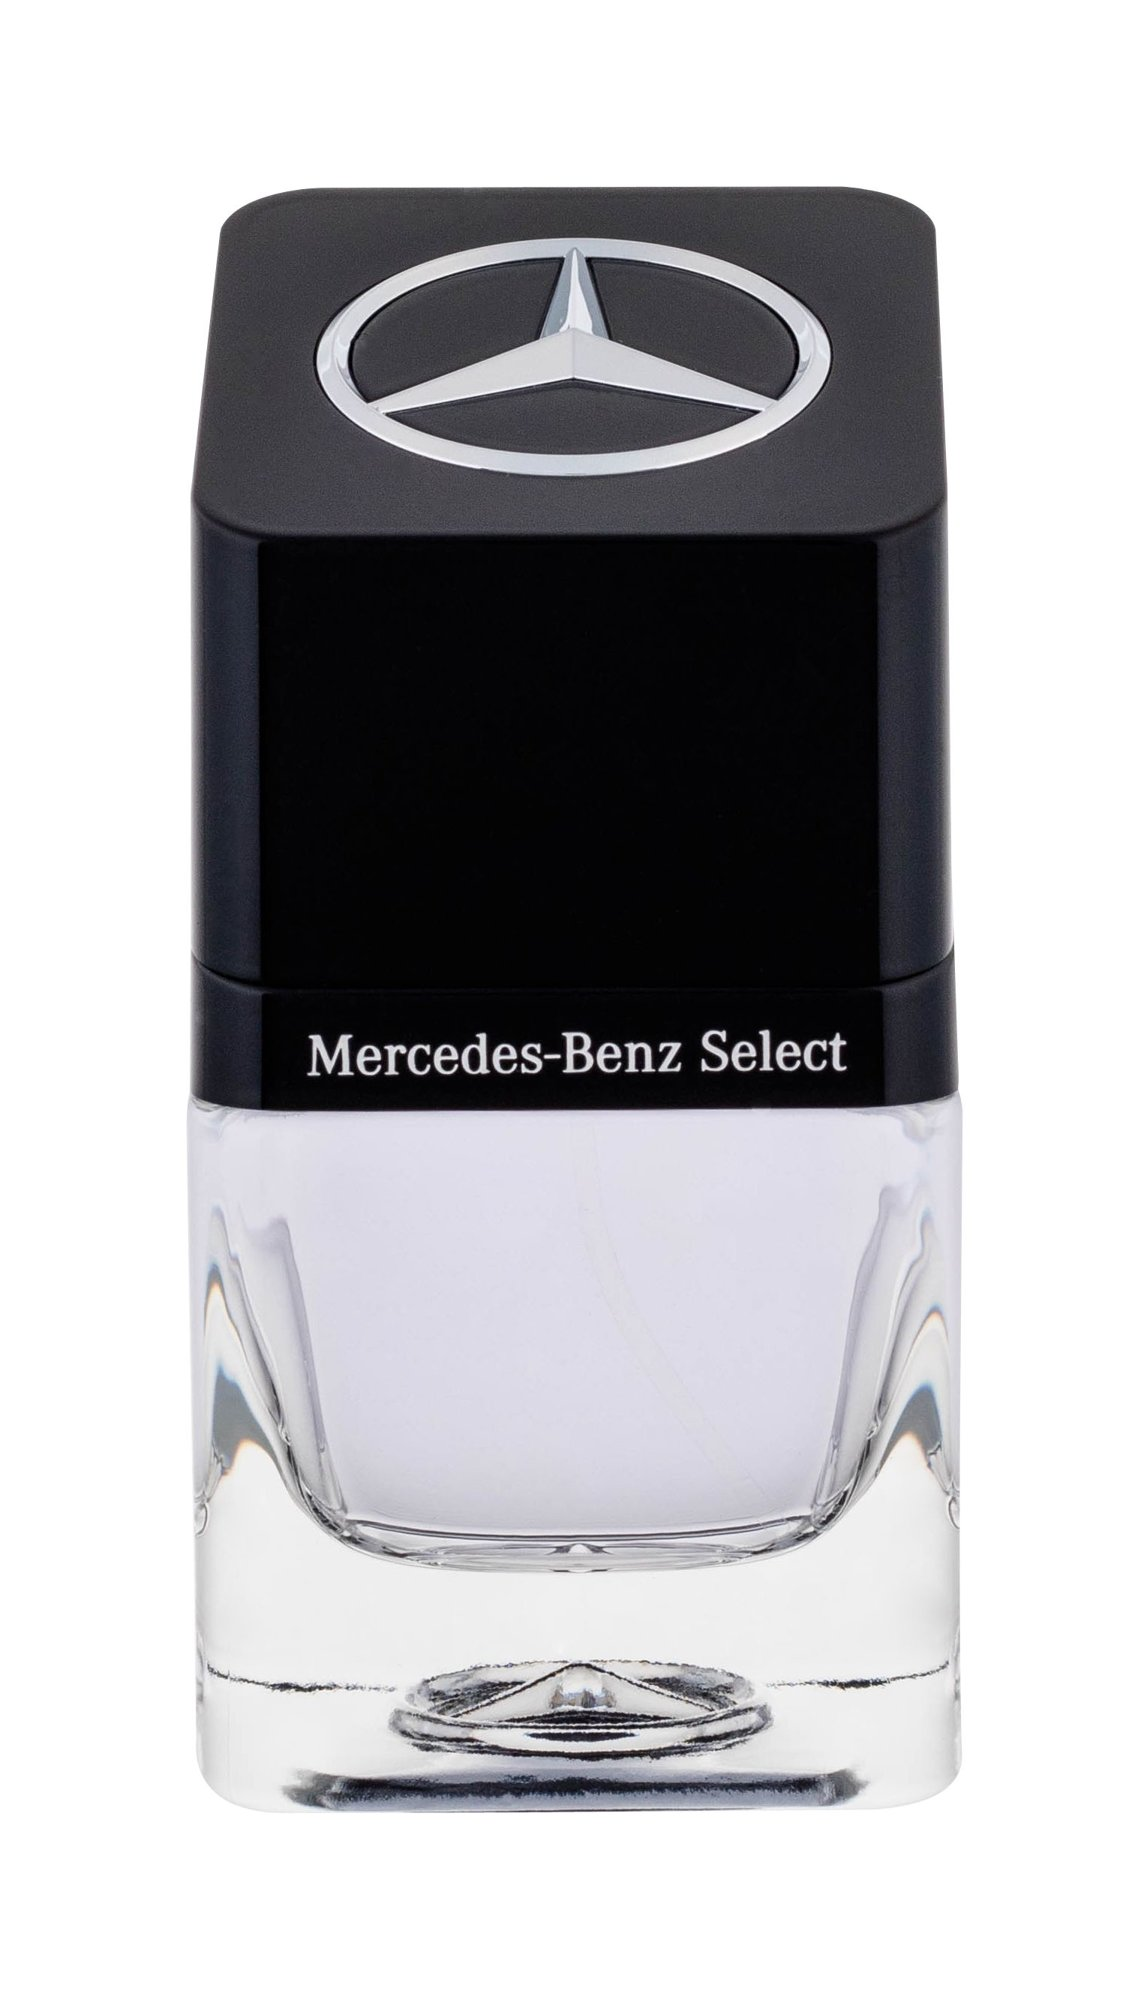 Mercedes-Benz Mercedes-Benz Select Eau de Toilette 50ml